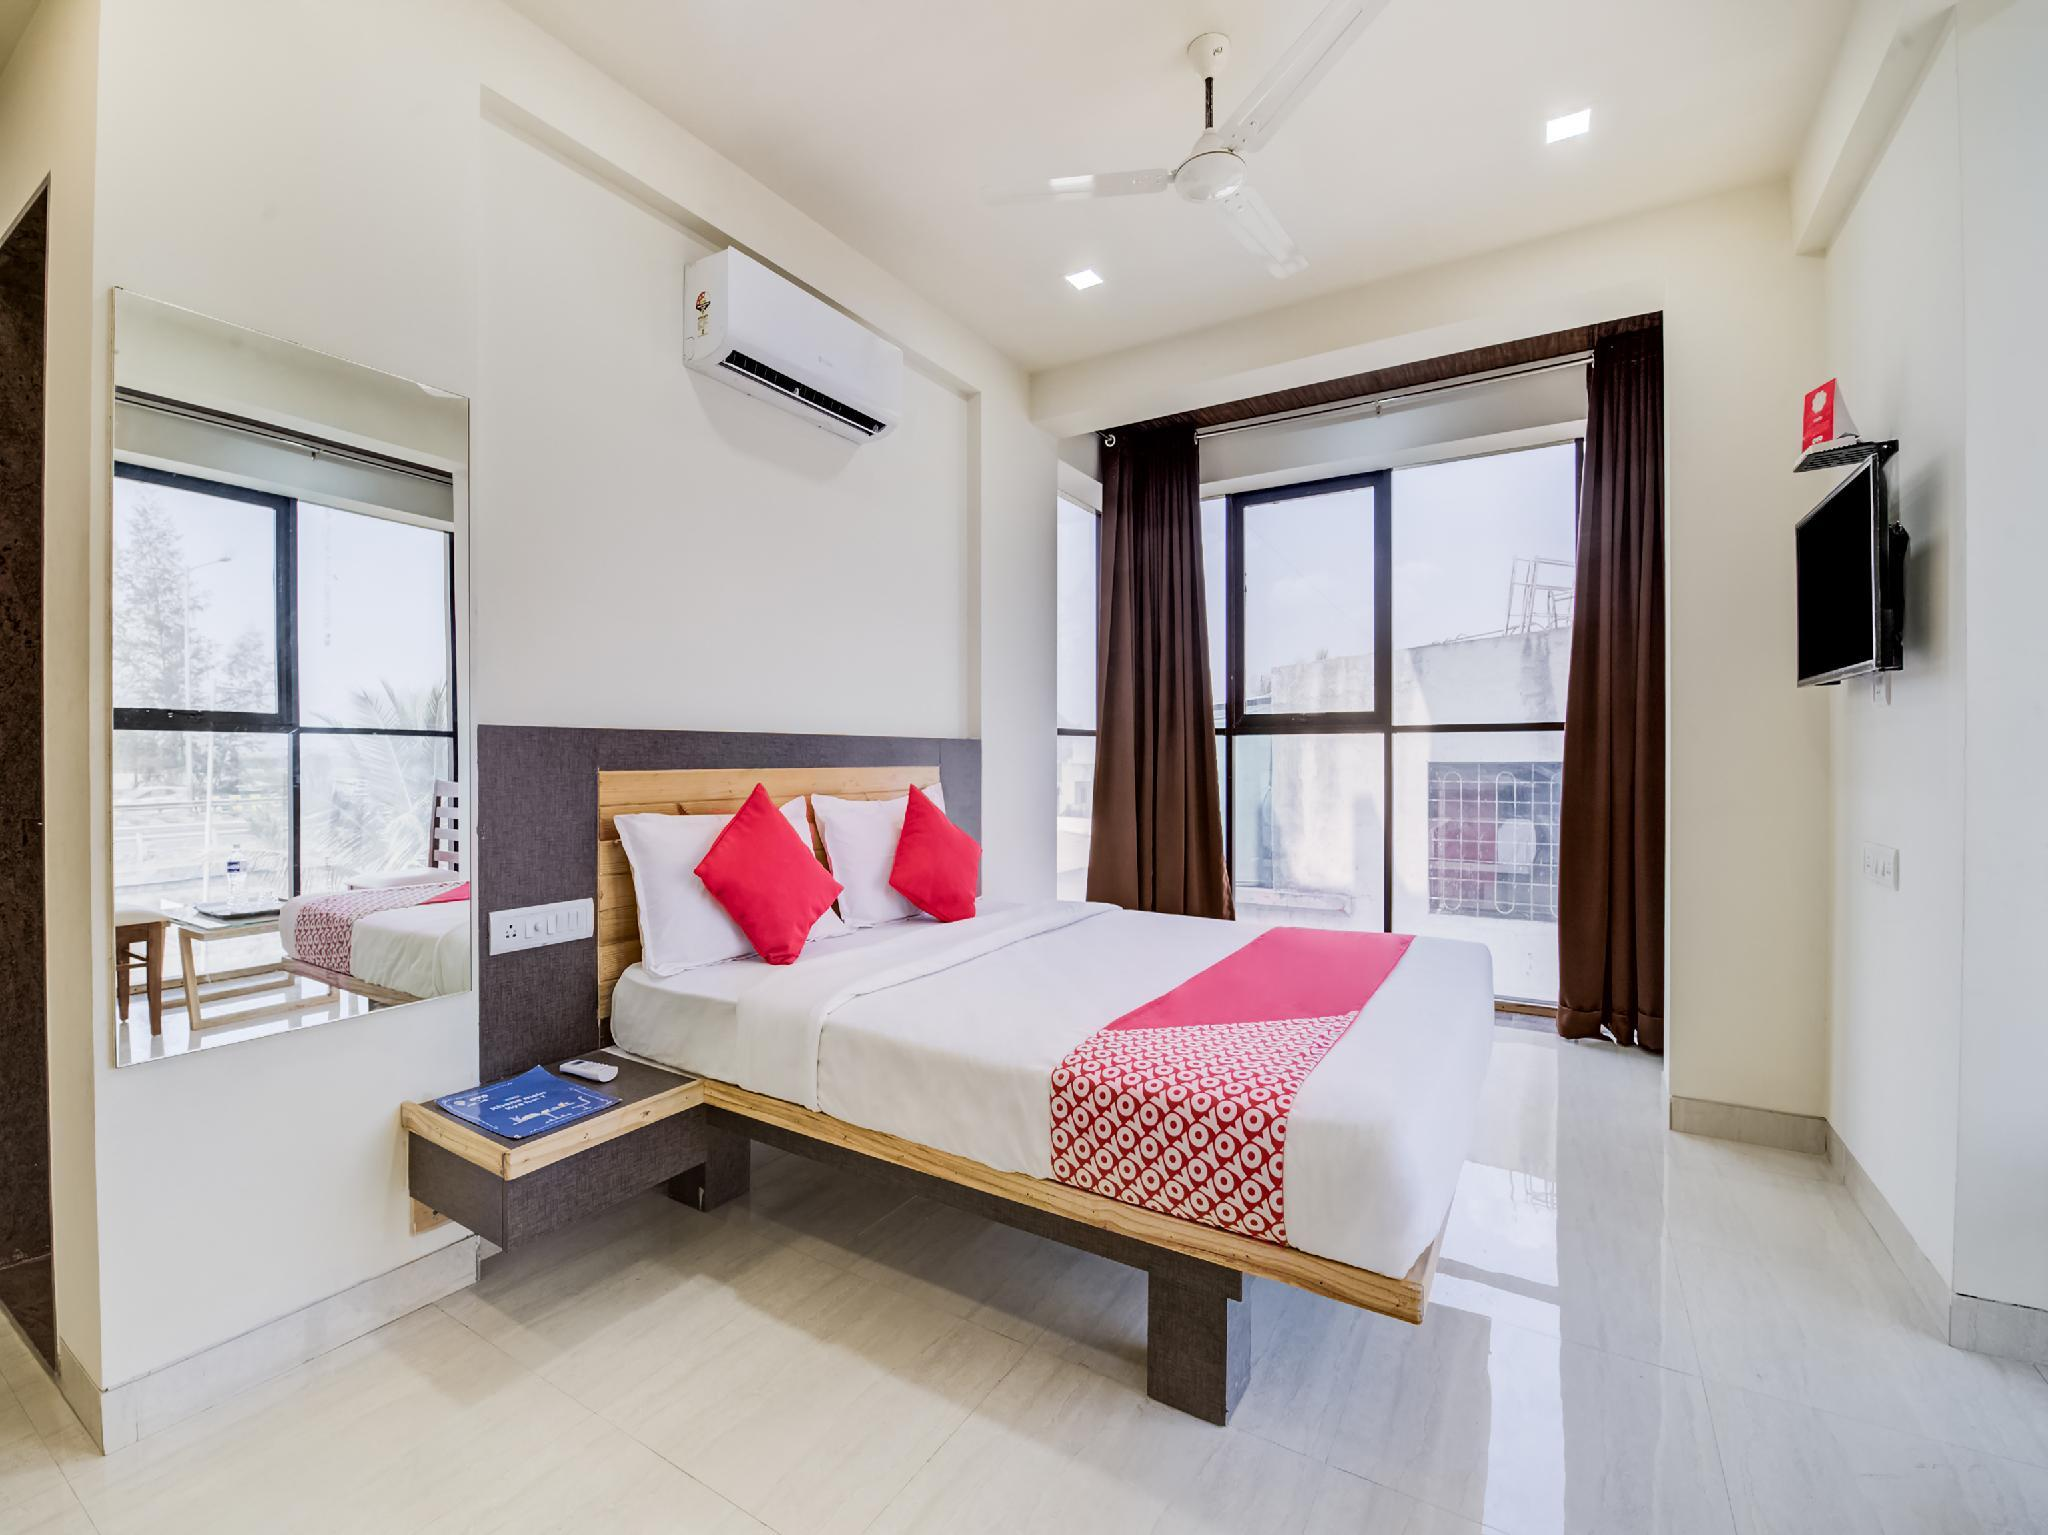 OYO 28164 Hotel Shubham Inn